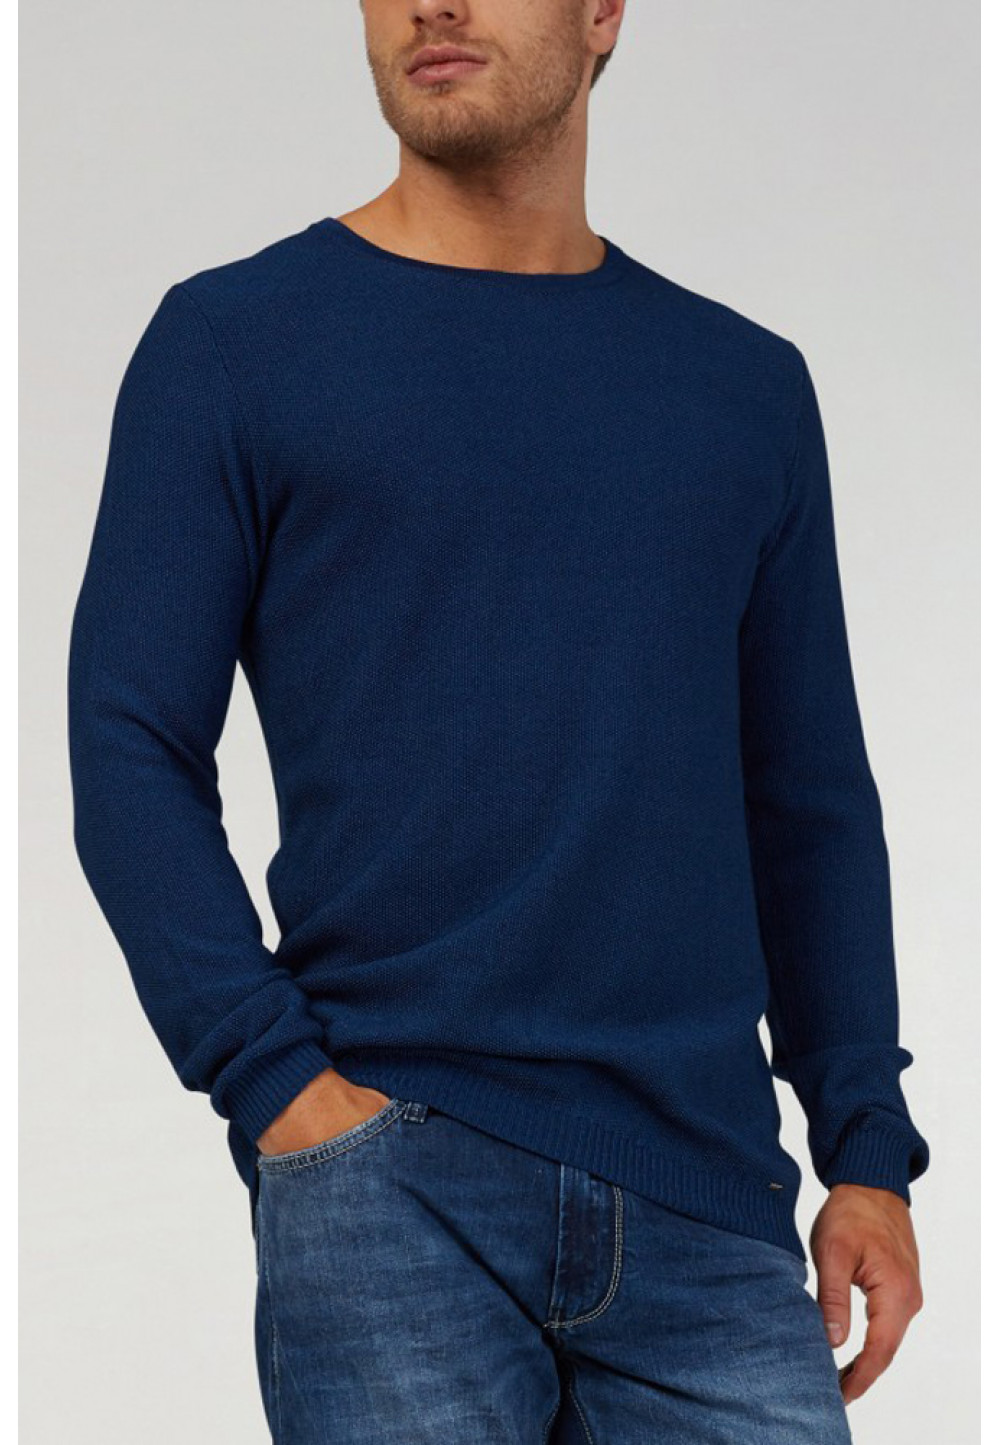 Вязаный синий свитер